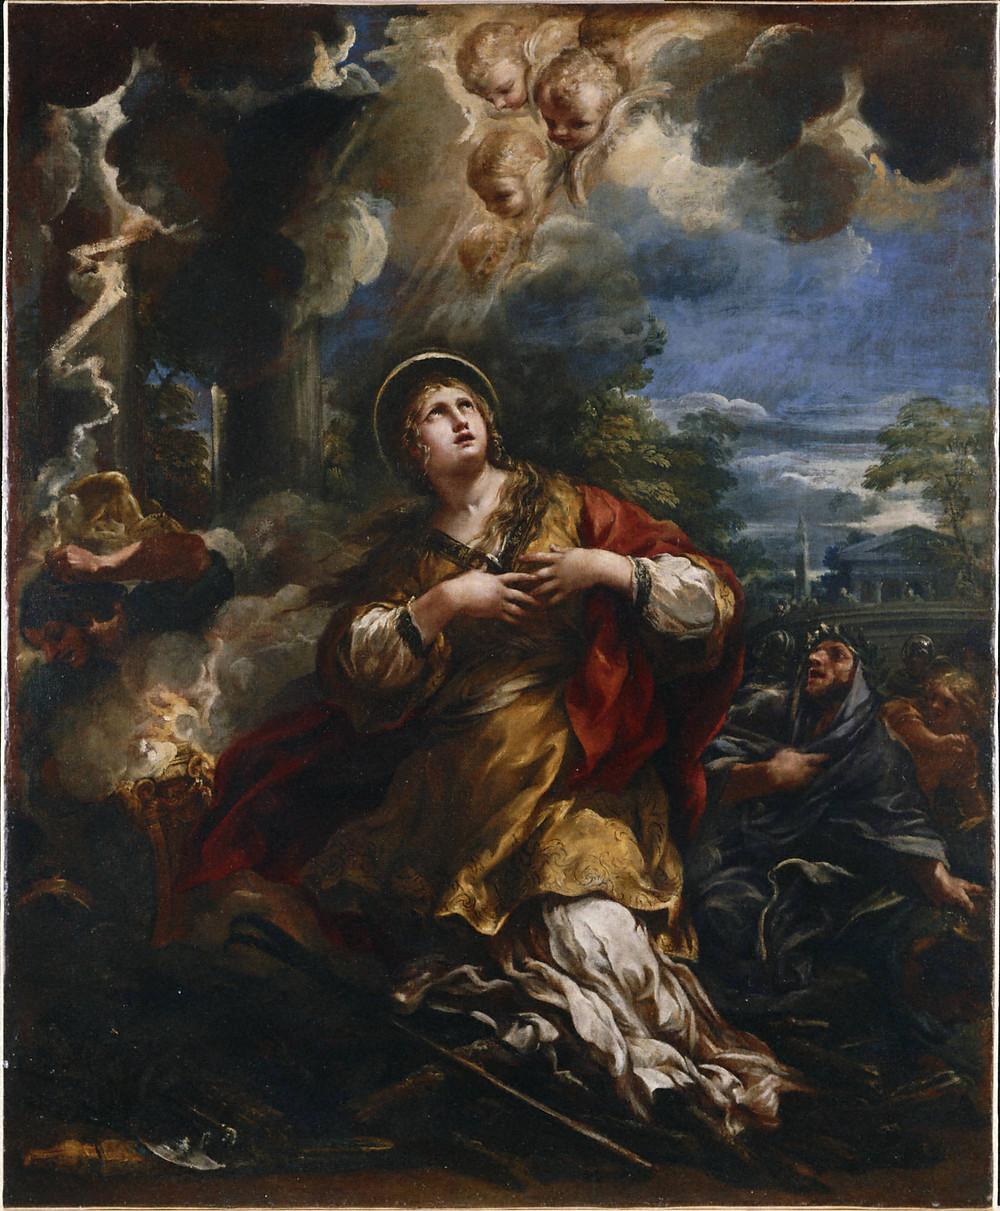 Saint Martina| Pamphlets To Inspire